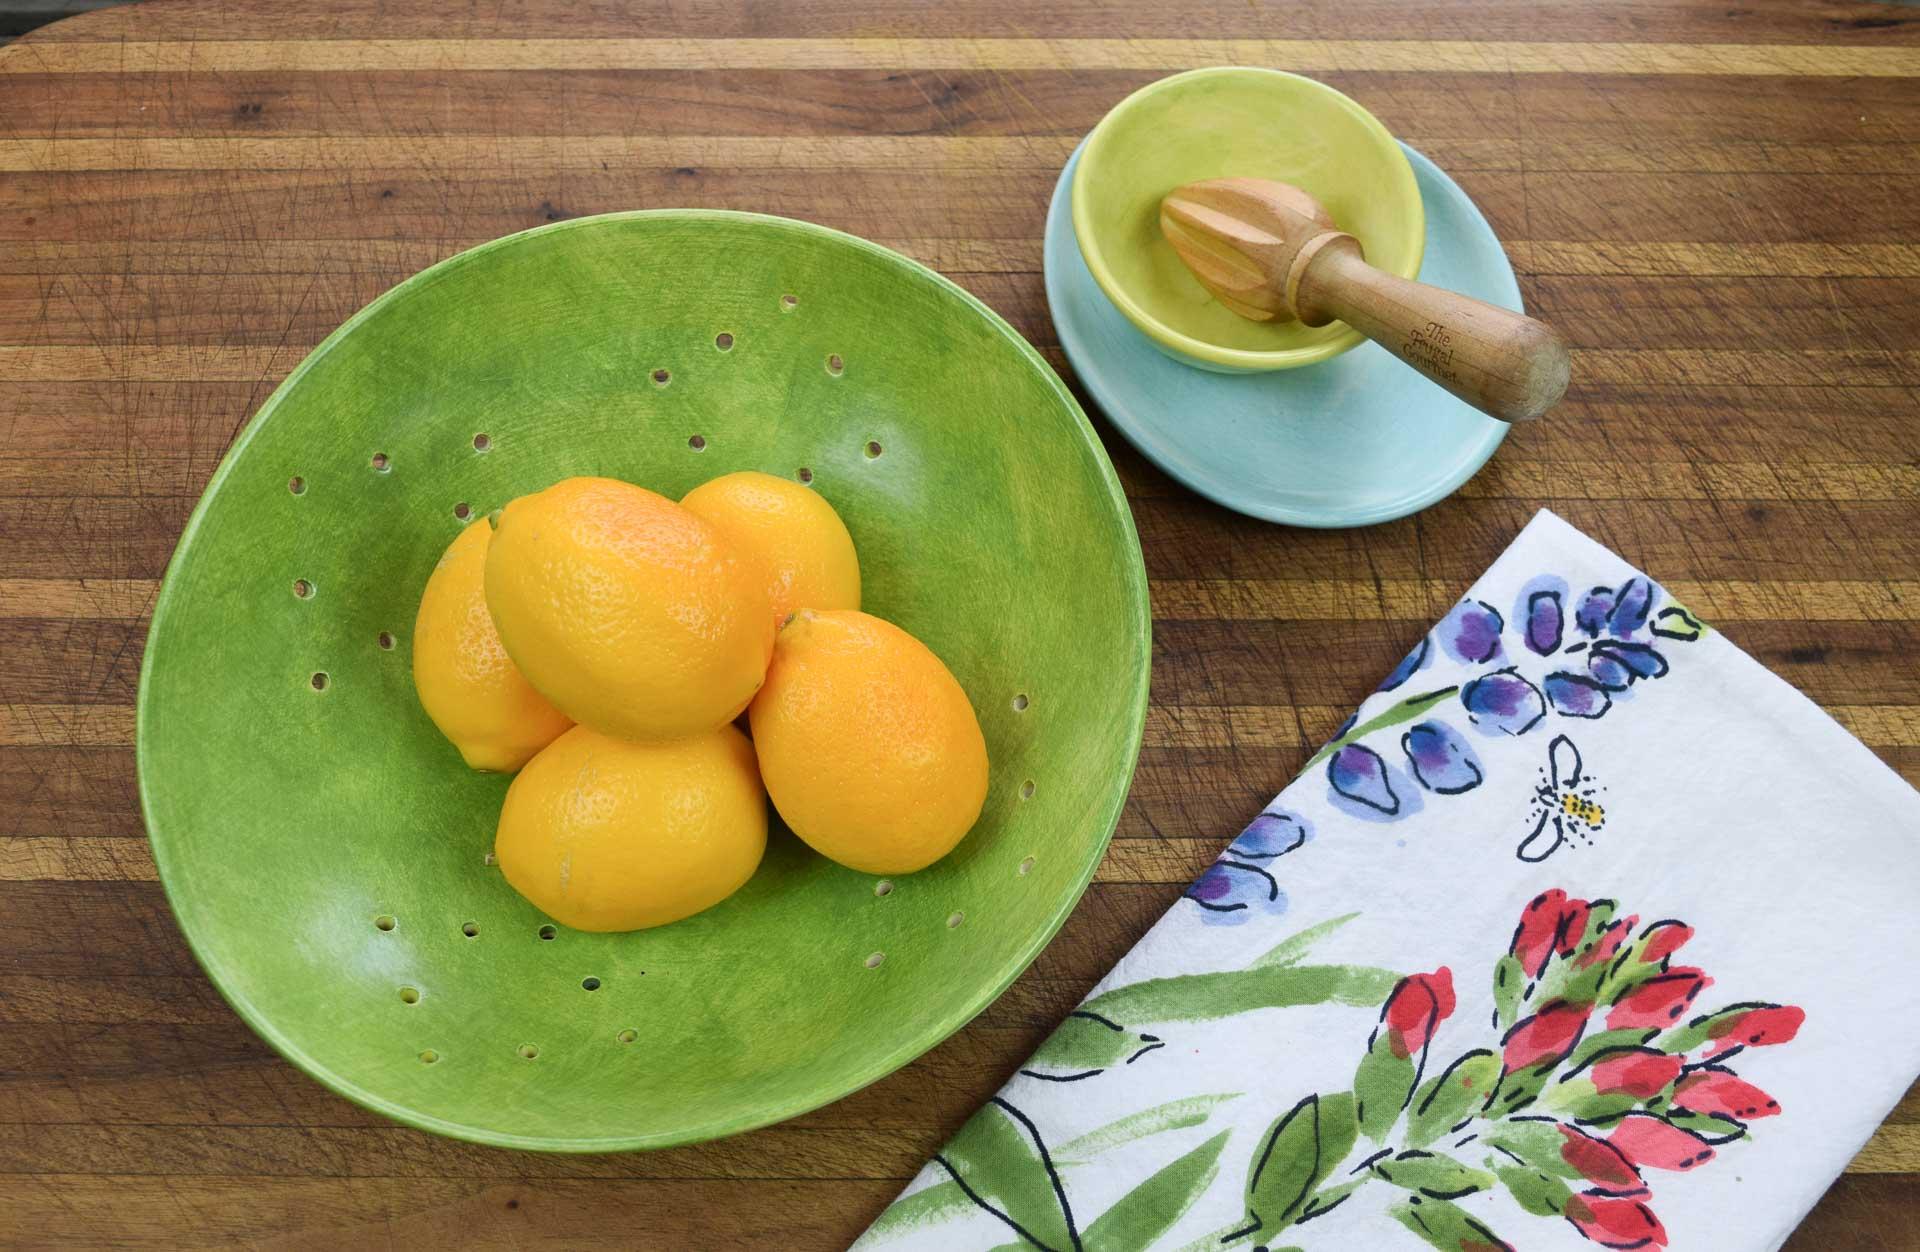 Melanie Thompson Artware Fine Ceramic Artware Handmade in Oregon the best artware for your table softness soft ceramics-9.jpg